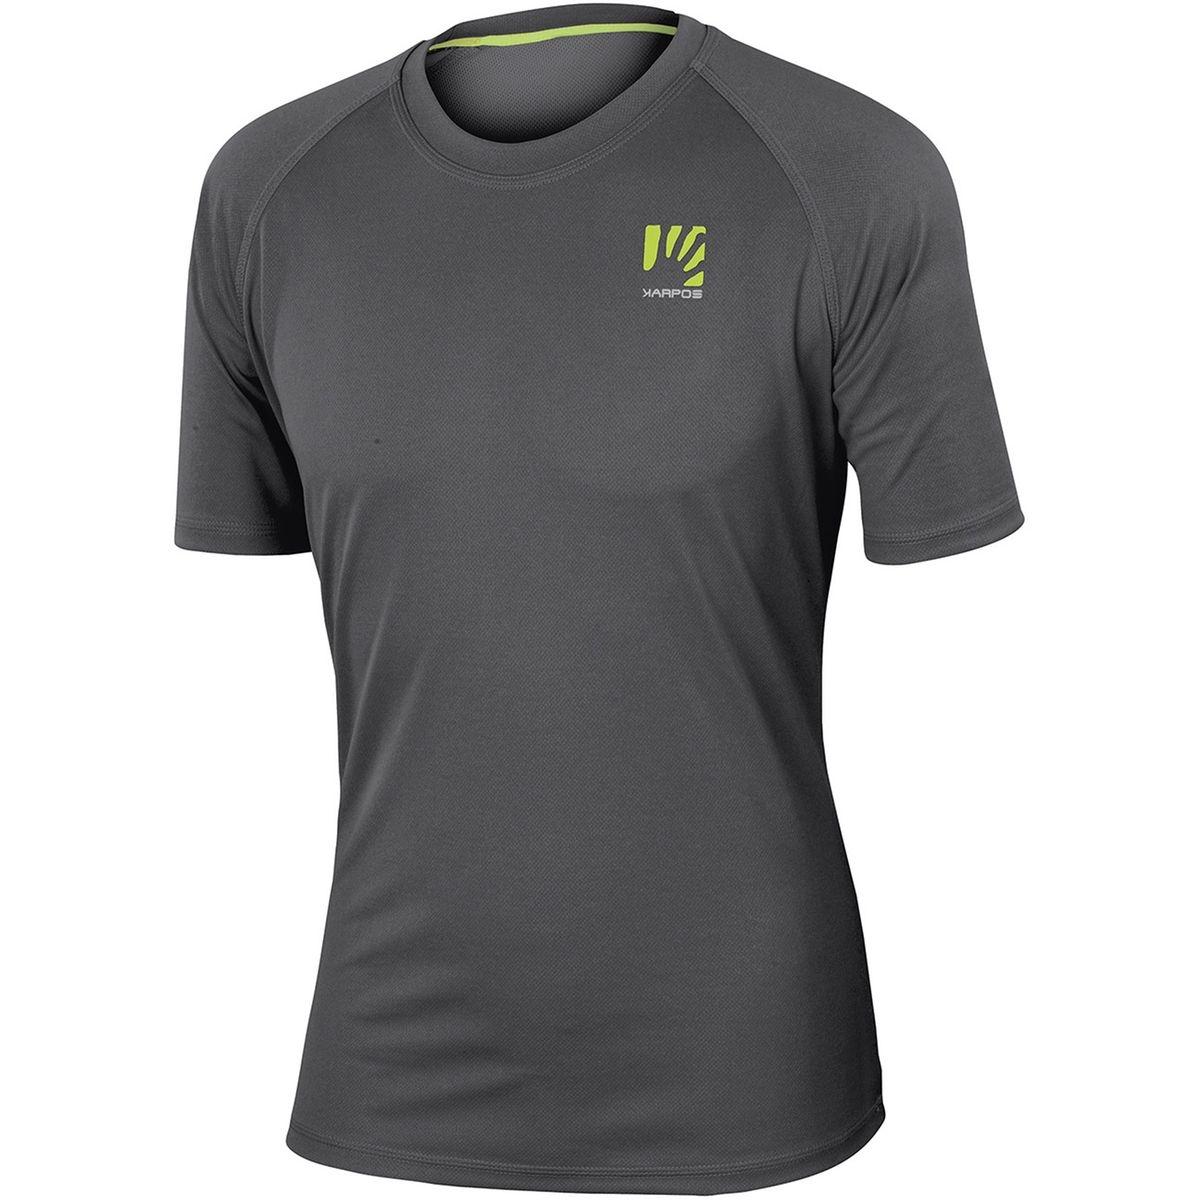 Hill Evo - T-shirt manches courtes Homme - gris